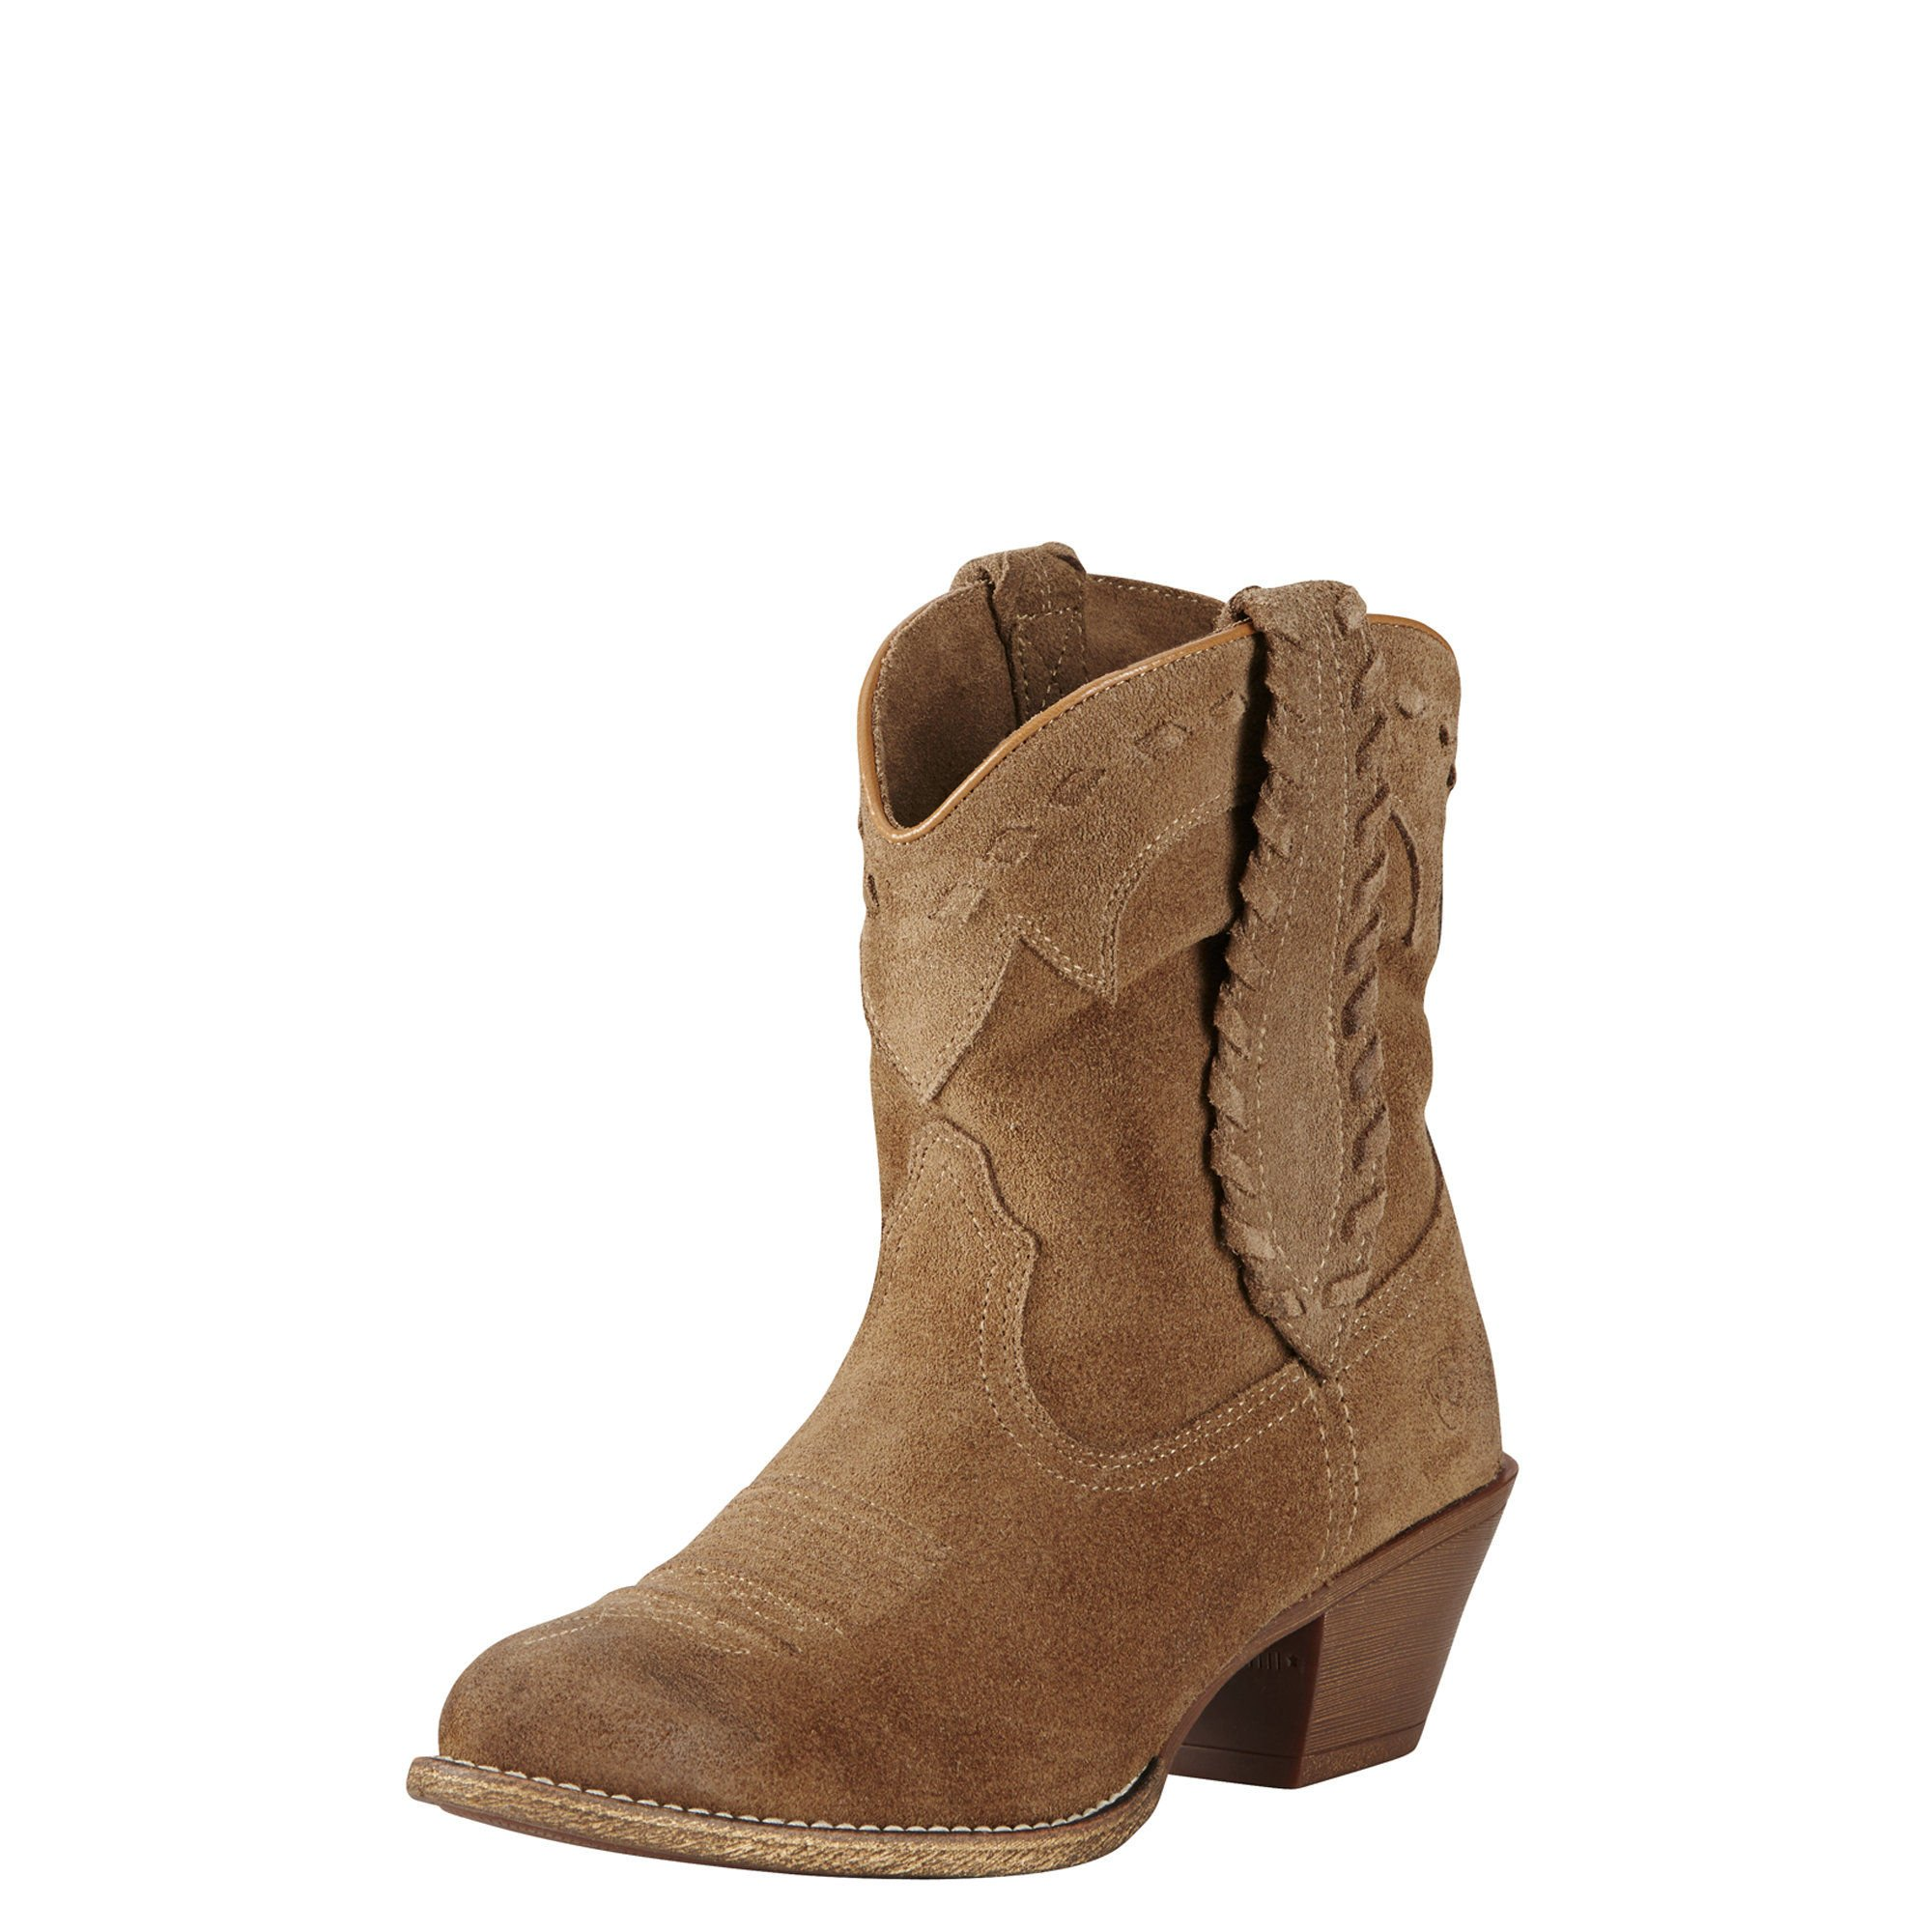 Ariat Women's Round up Rianda Western Cowboy Boot, Relaxed Bark, 6.5 B US